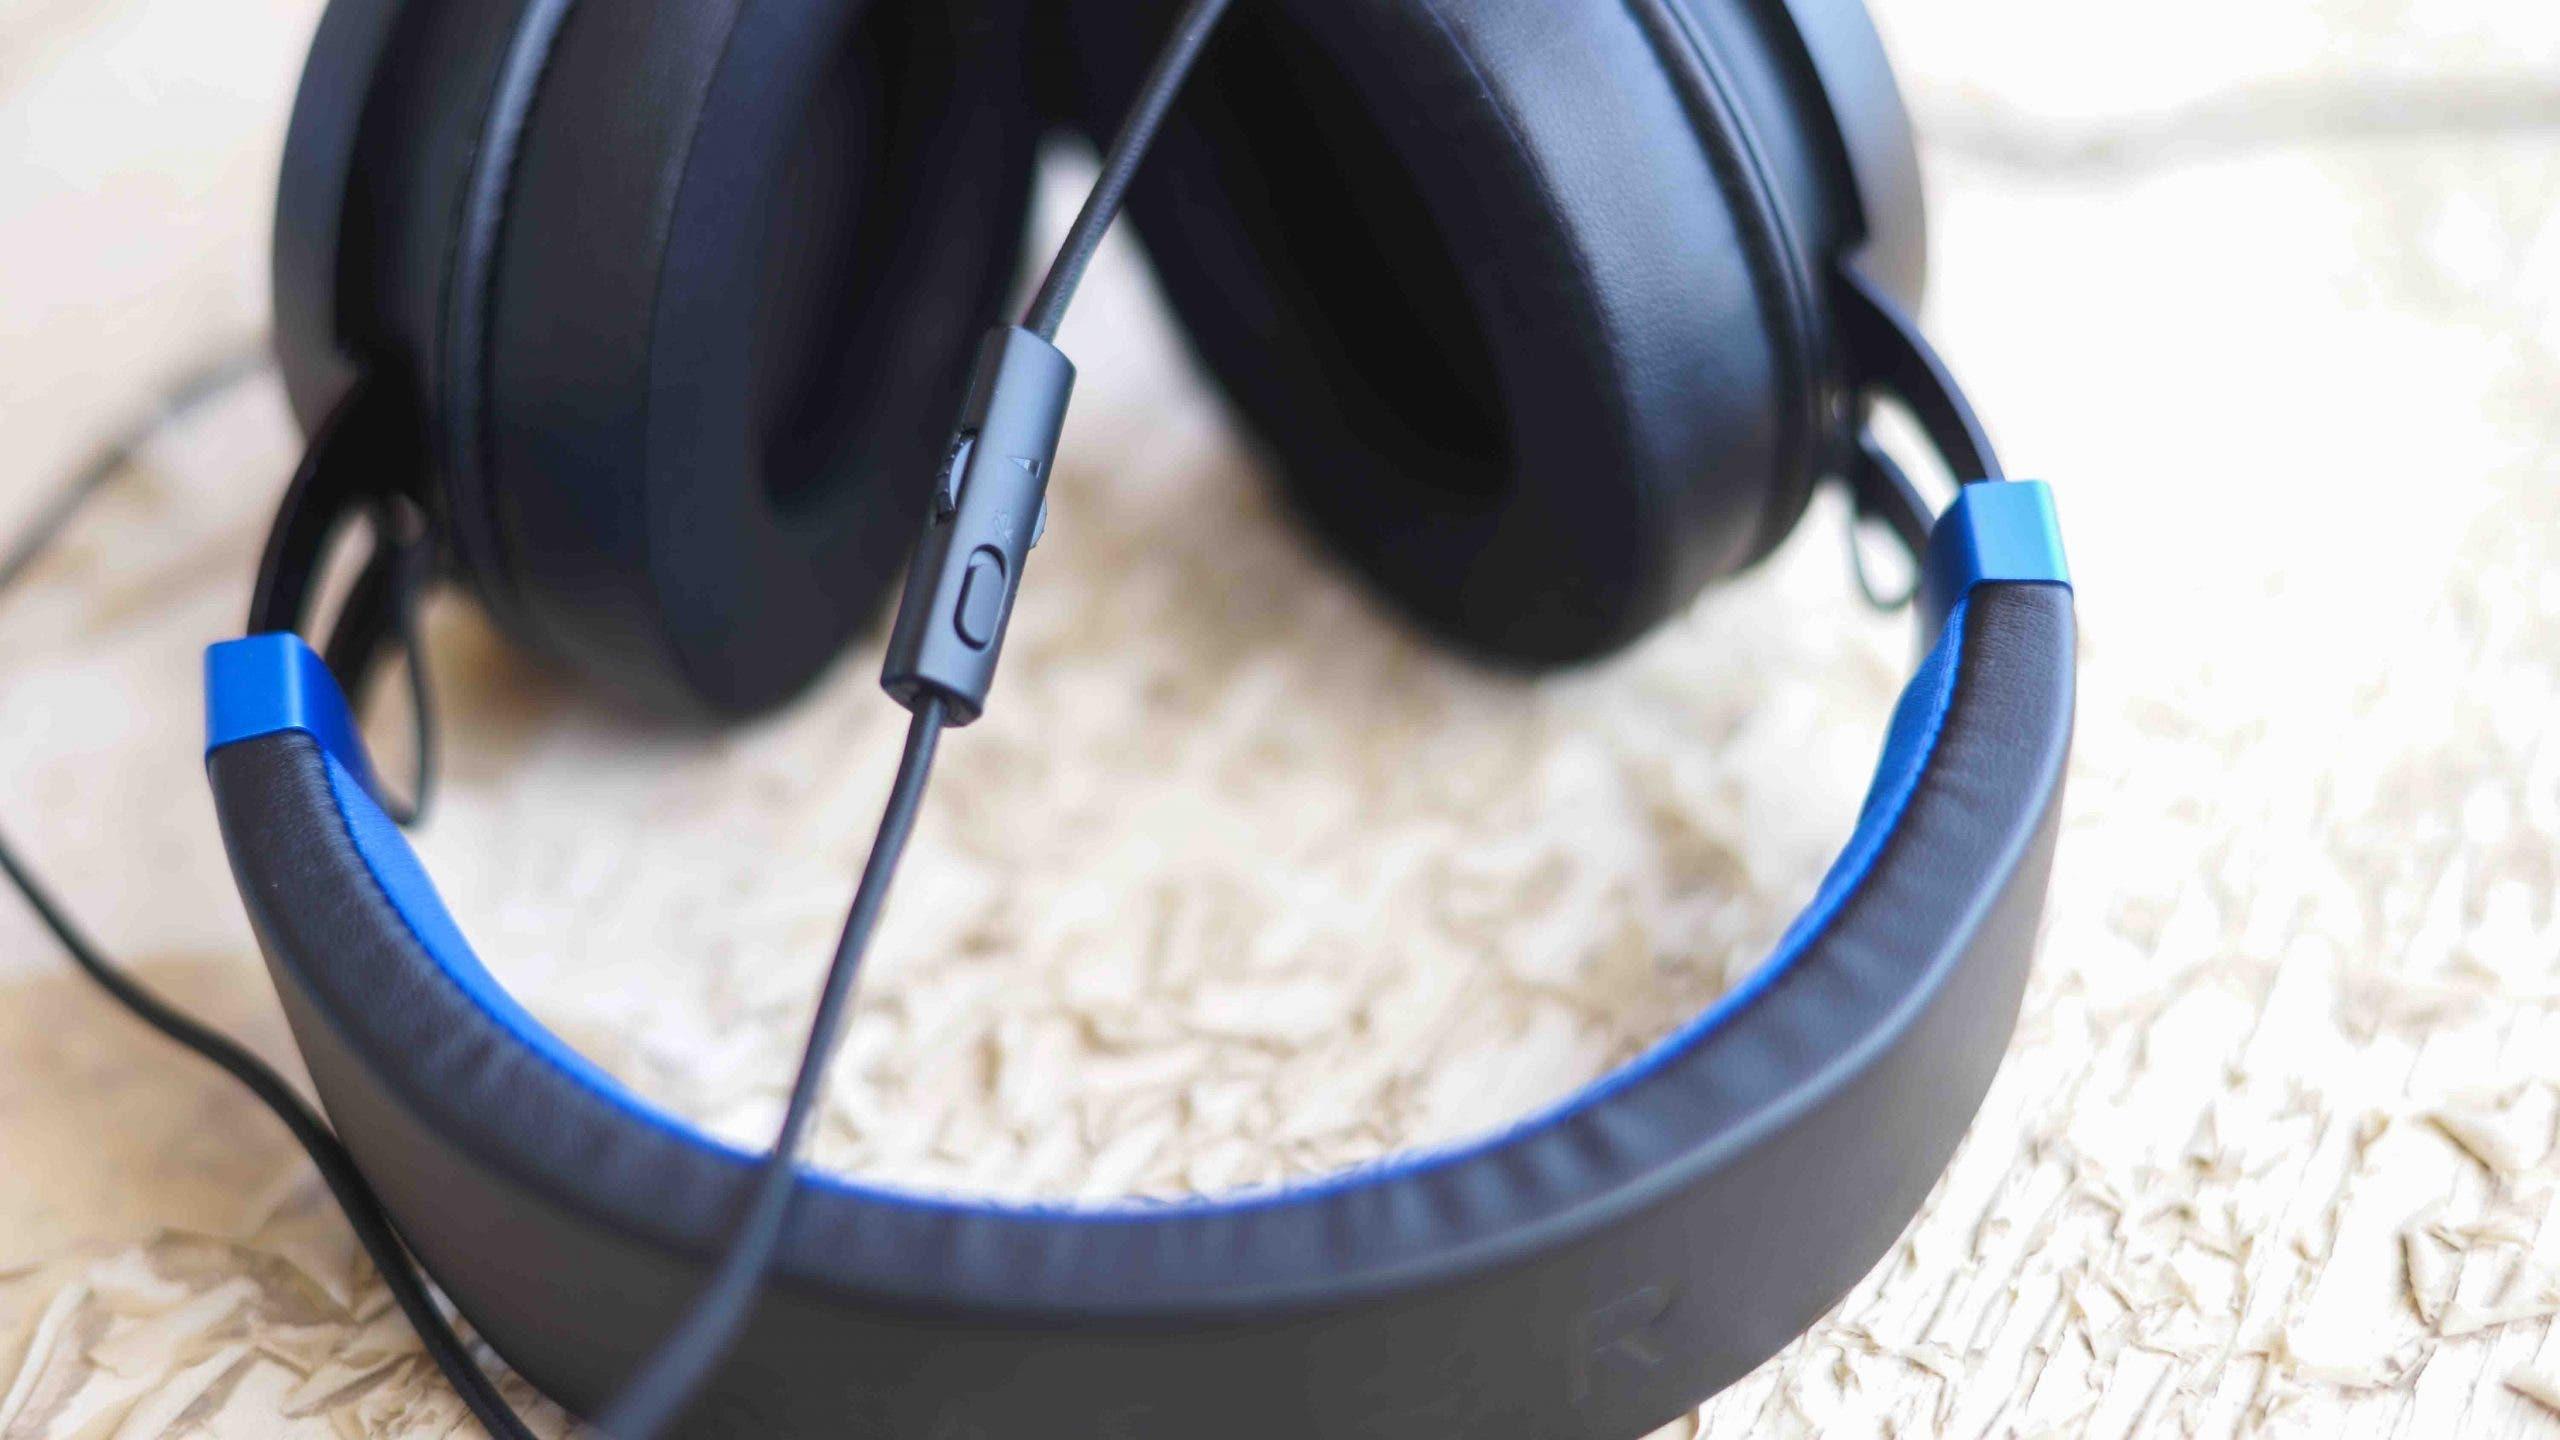 Análisis de los auriculares Razer Kraken for Console 4